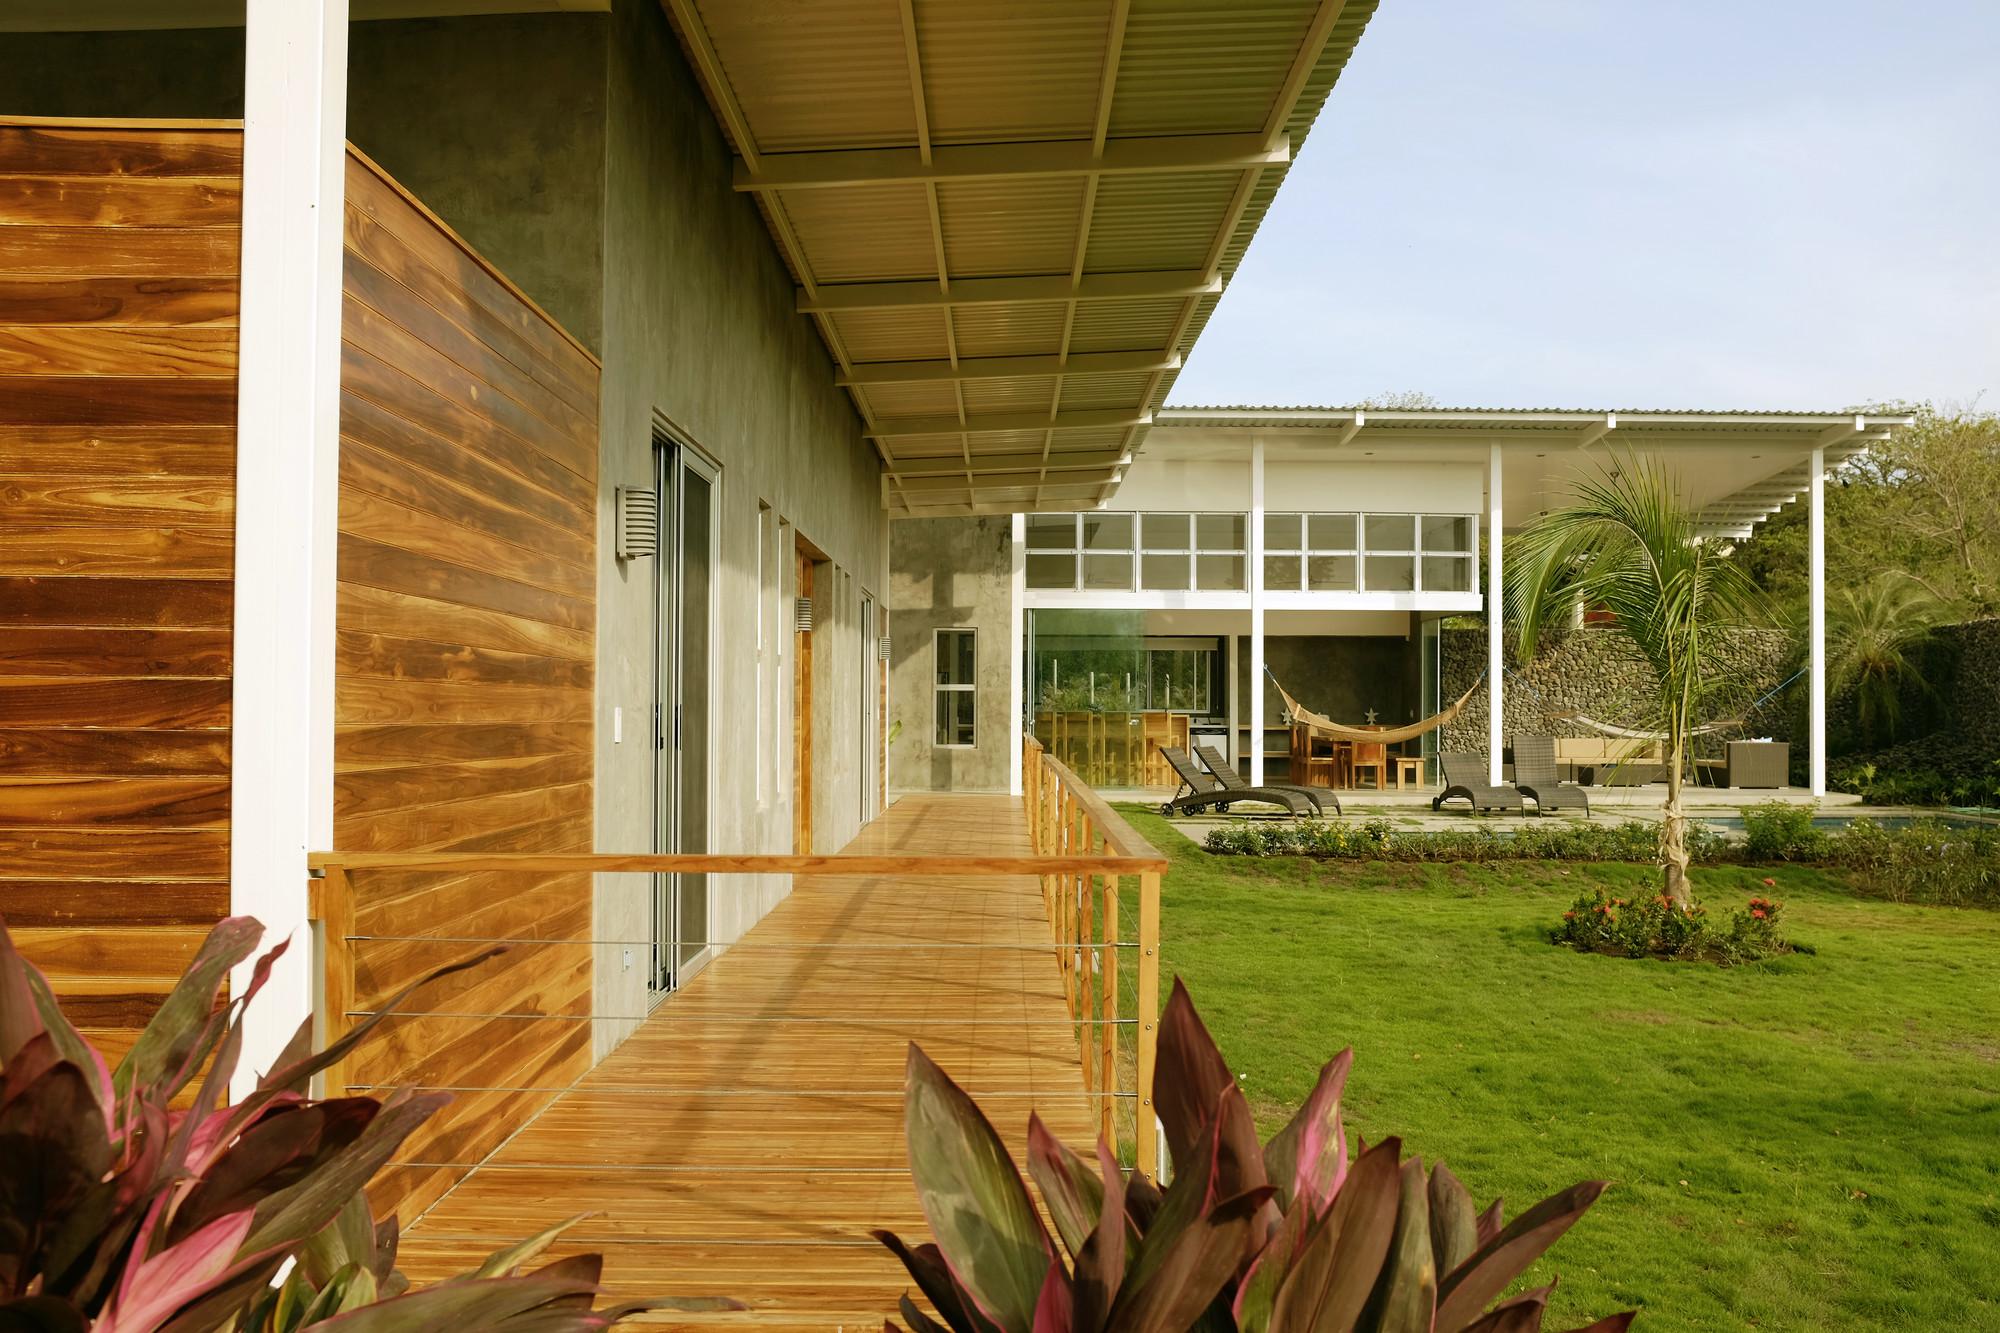 Galer a de casa jard n del mar salagnac arquitectos 1 for Raschella casa jardin